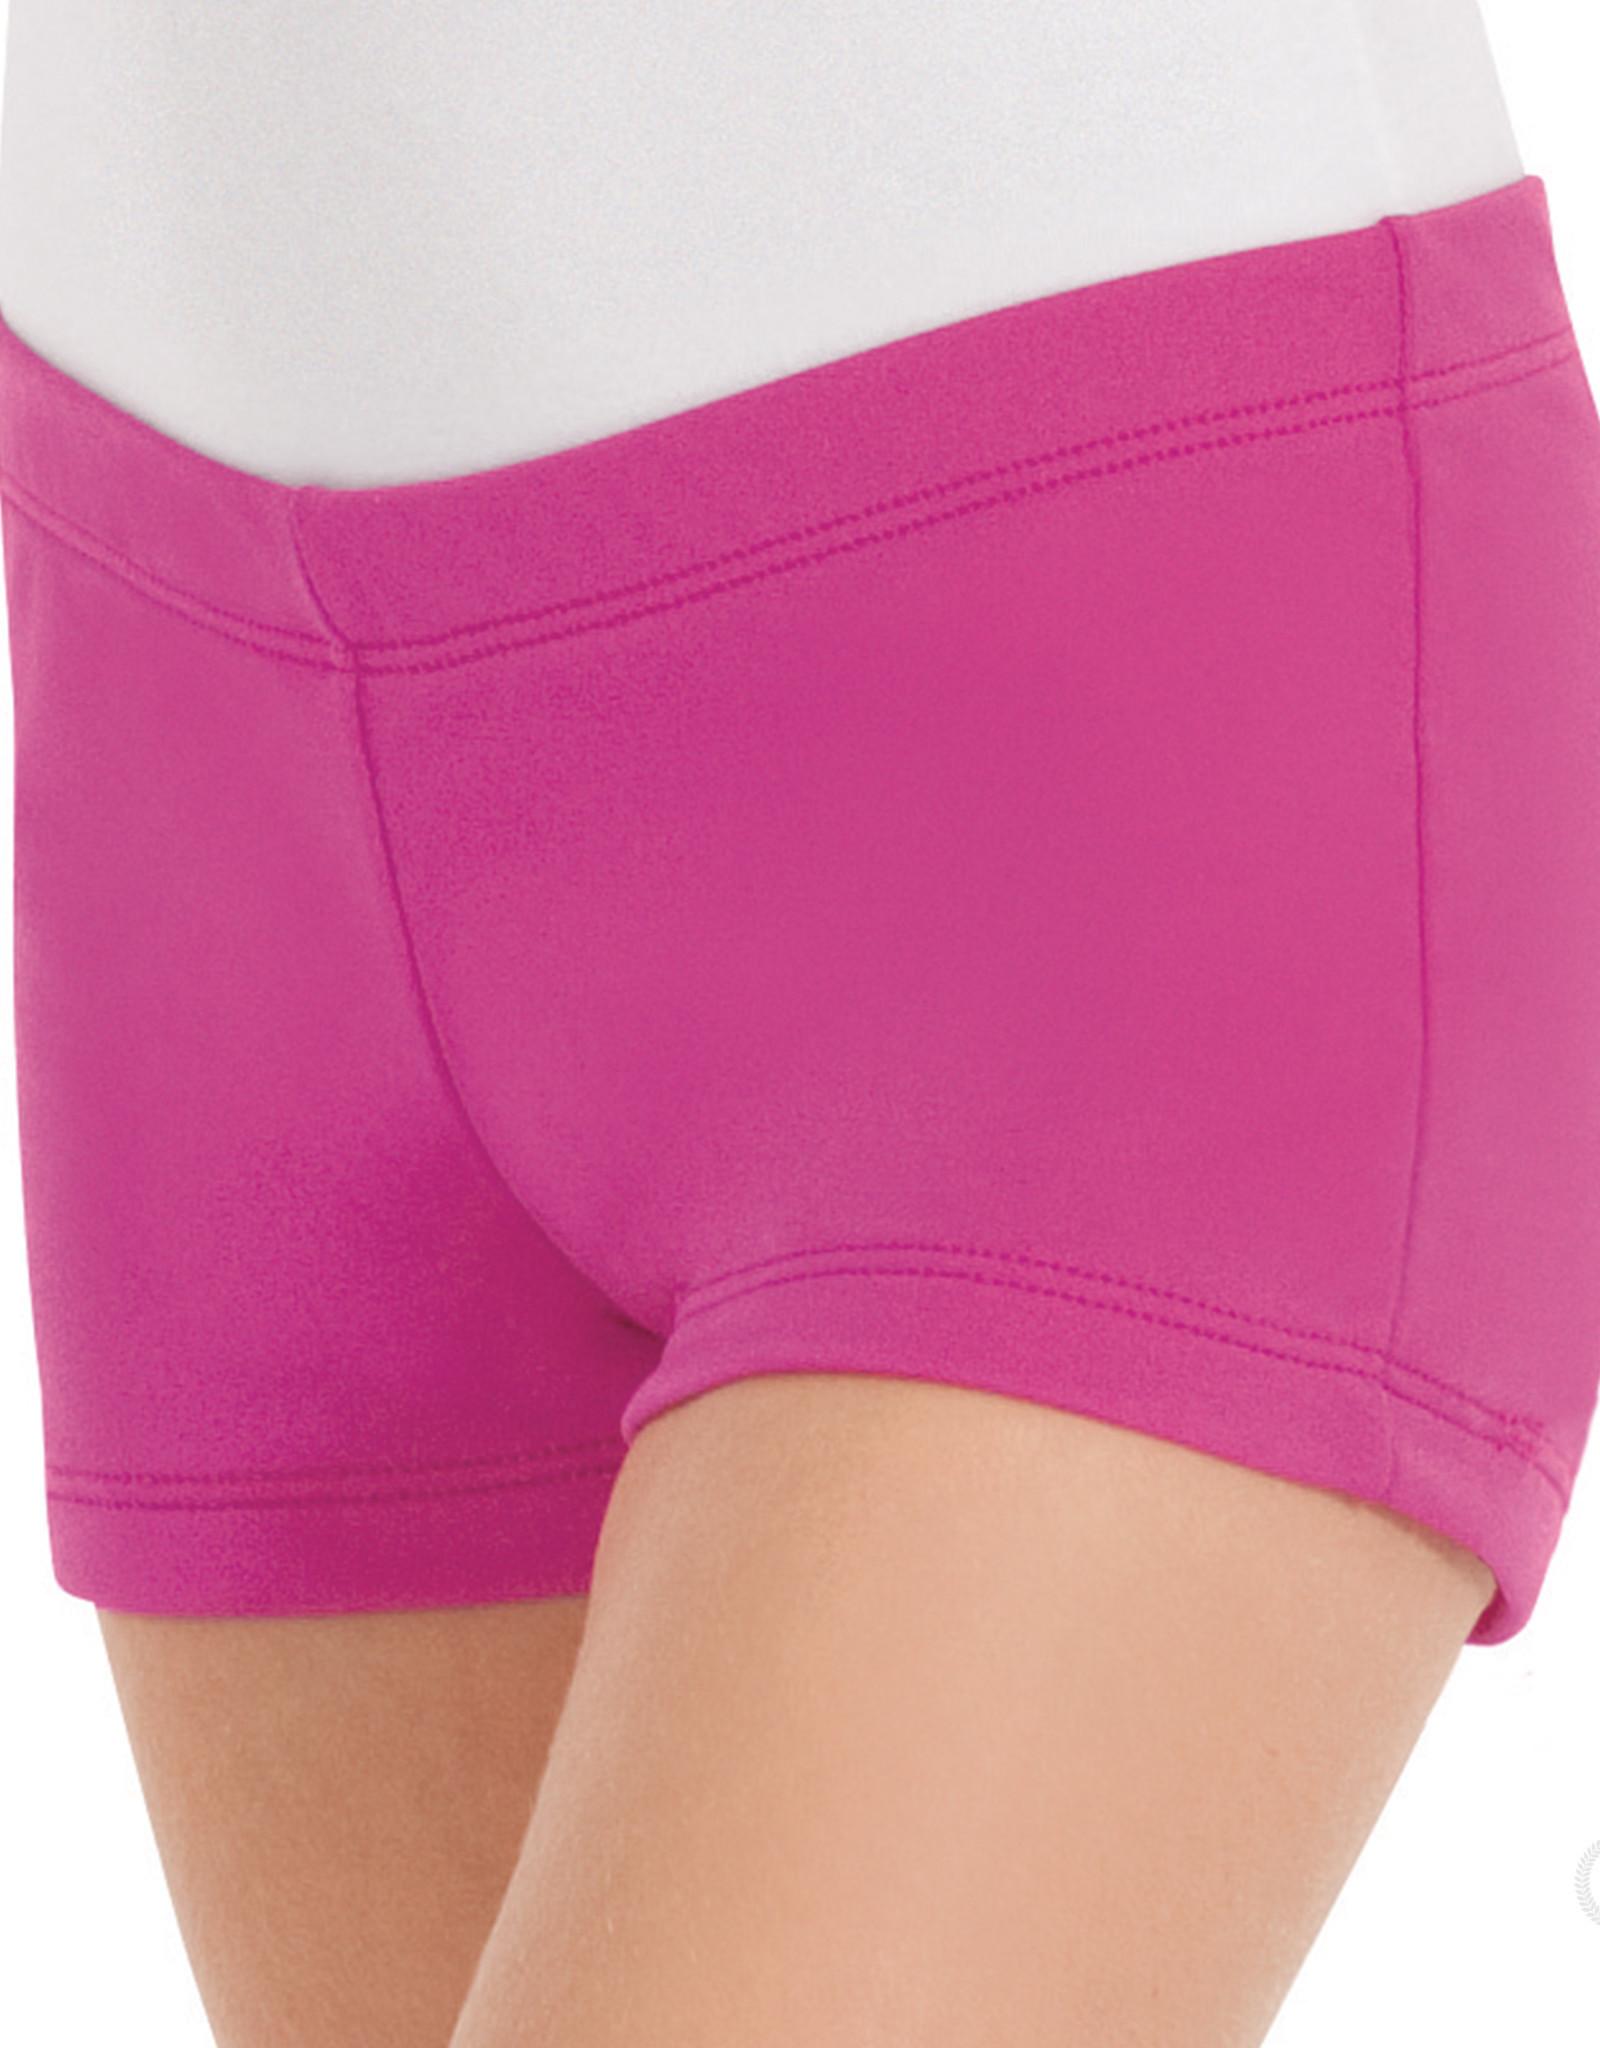 Eurotard 44335c Booty Shorts with Tactel® Microfiber